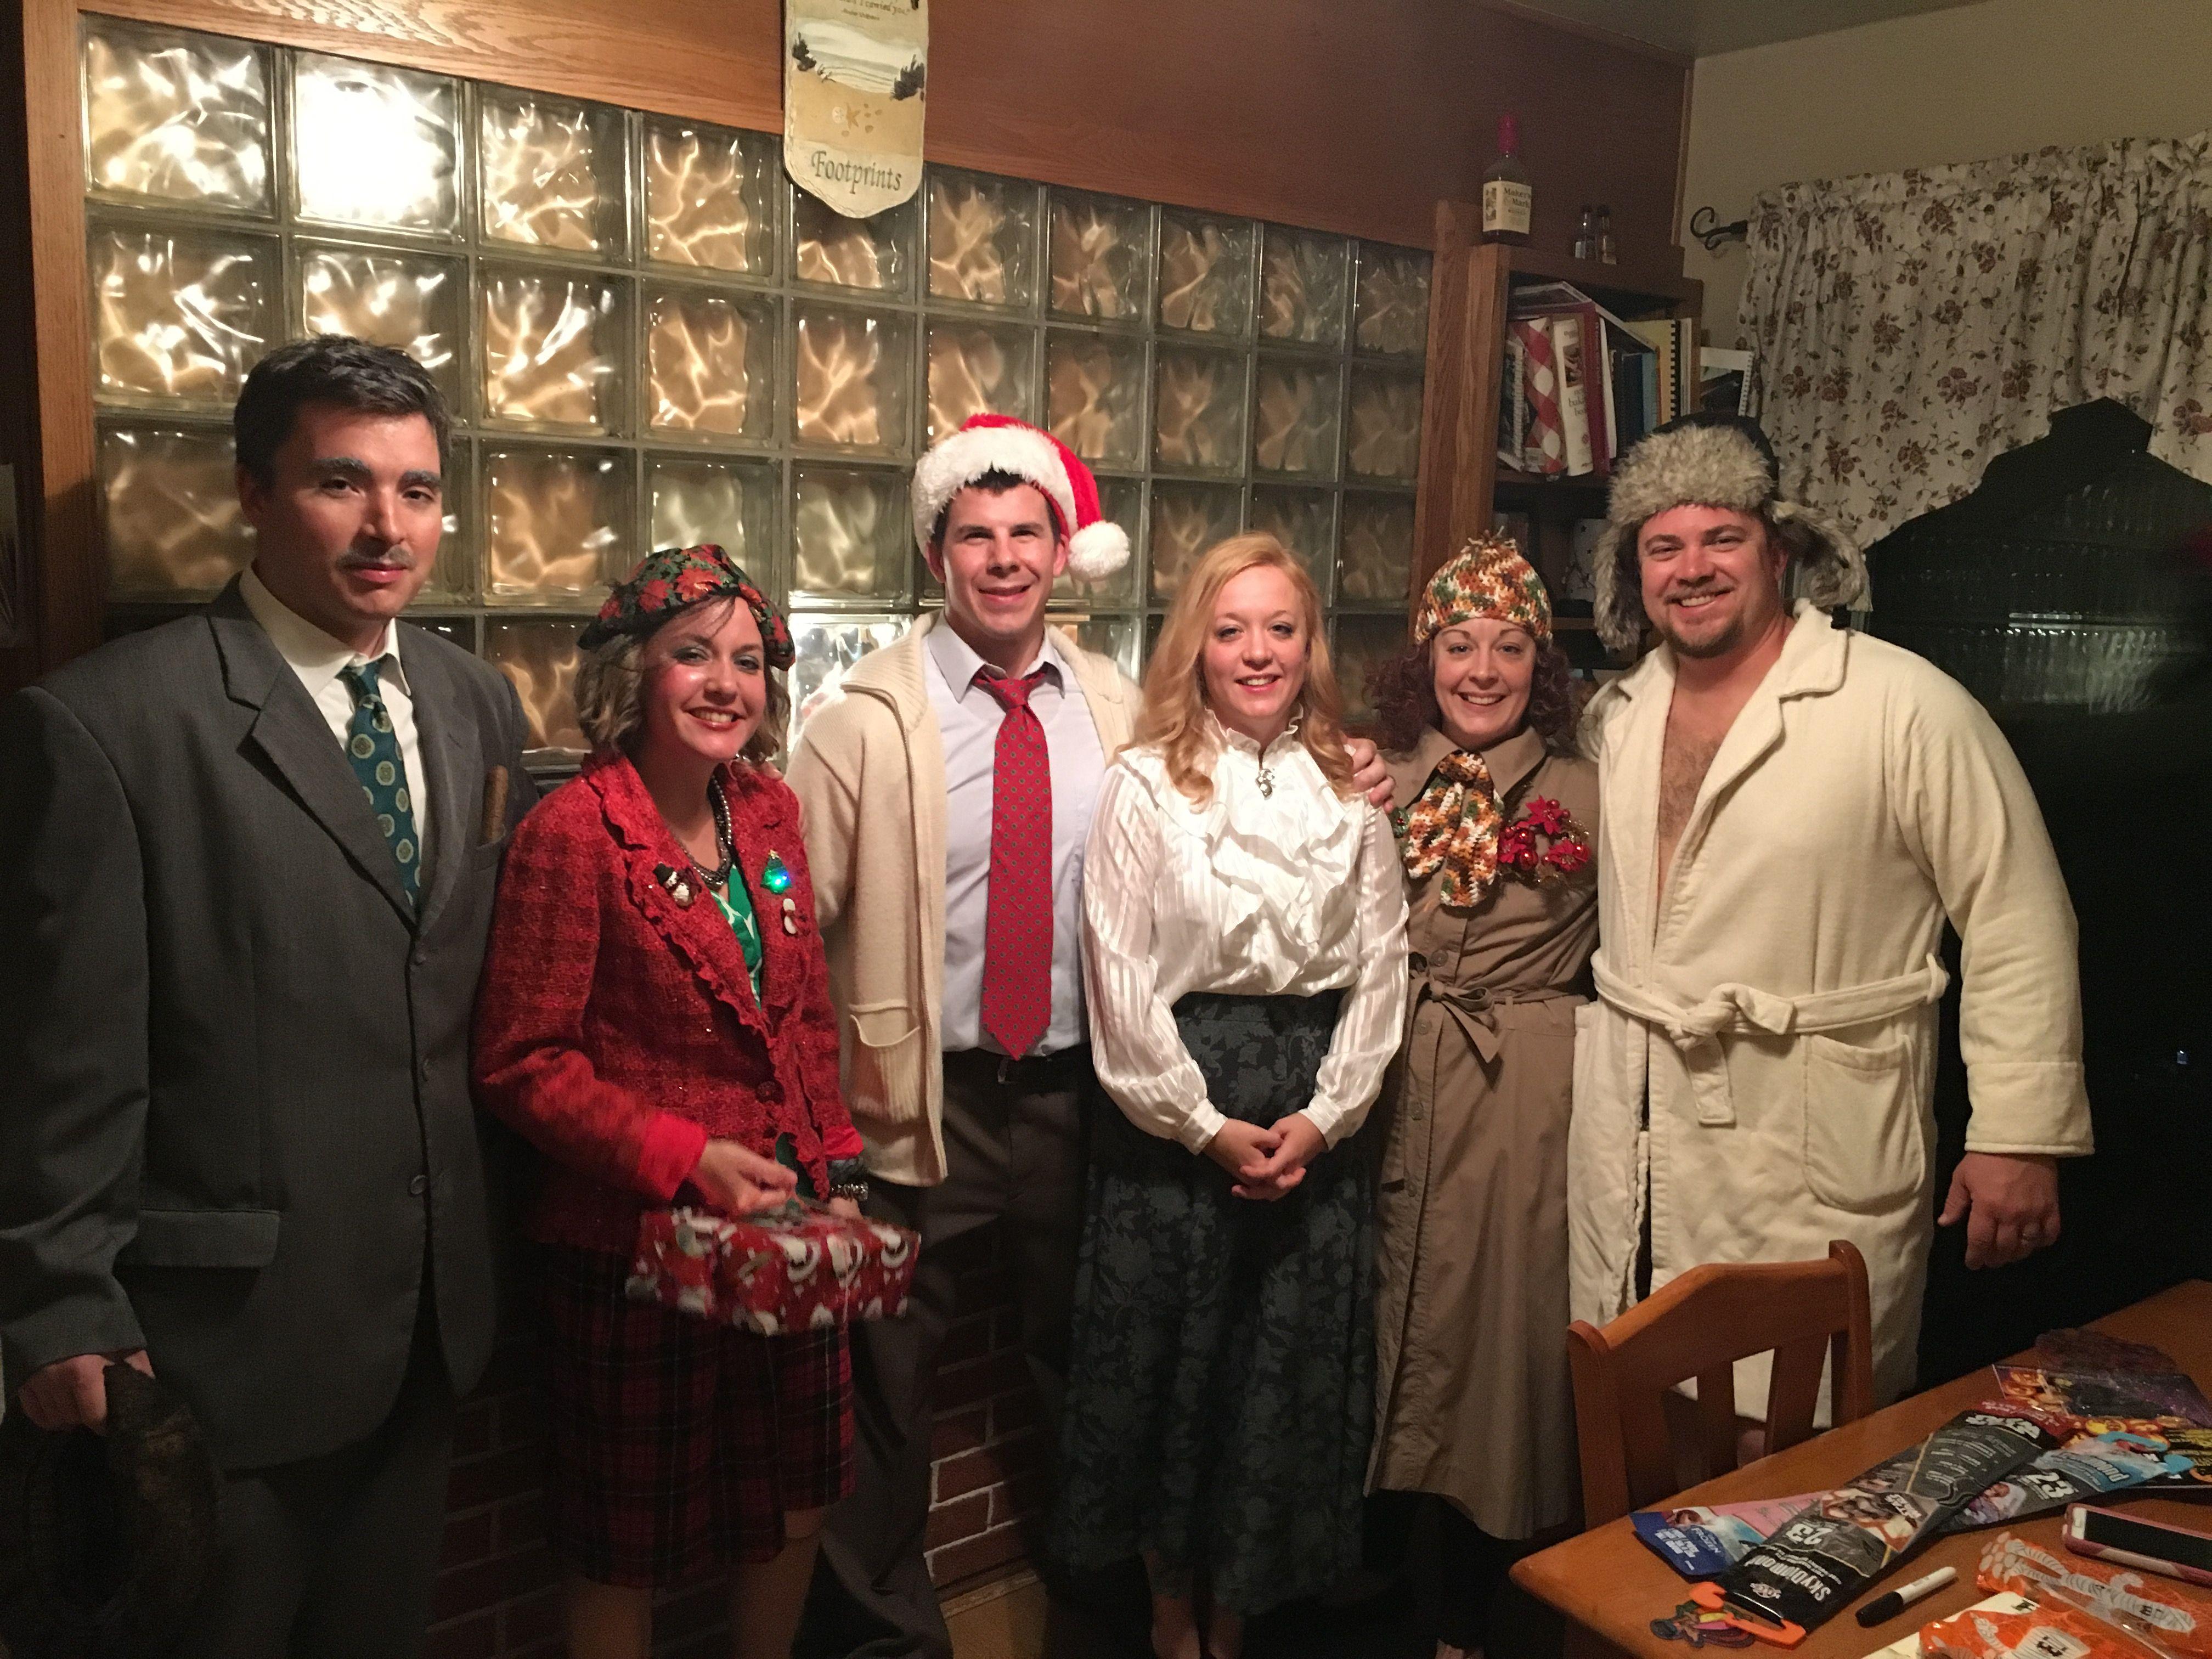 Christmas Vacation Halloween Group Costume Festive